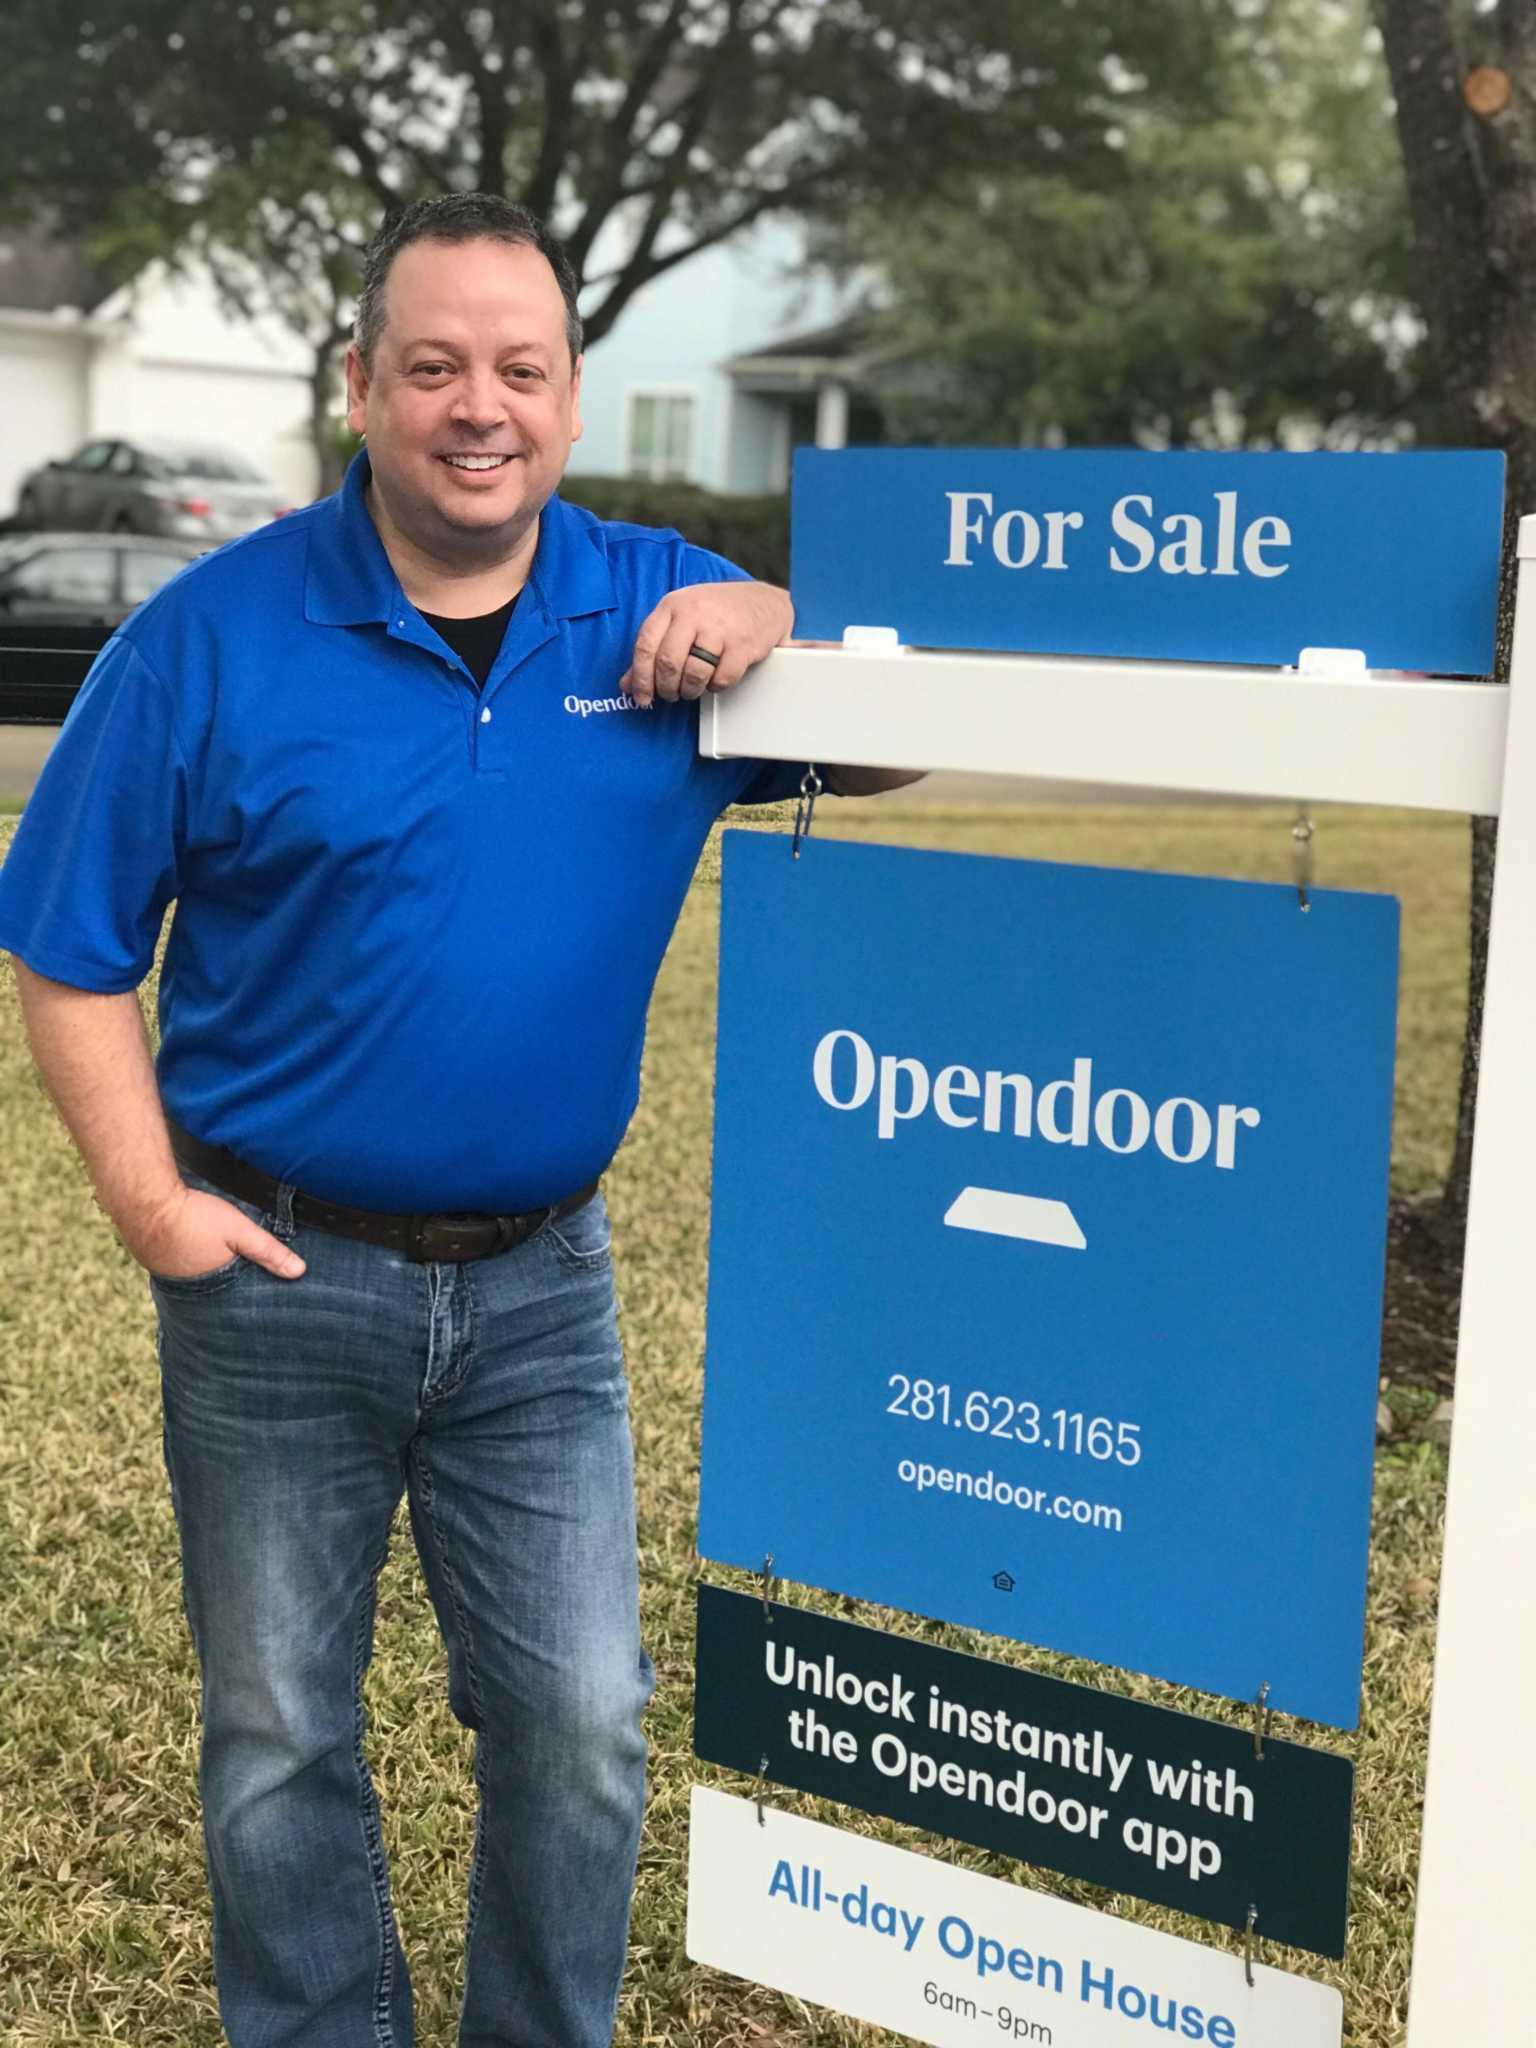 Opendoor moves into title and escrow, RedfinNow to San Antonio